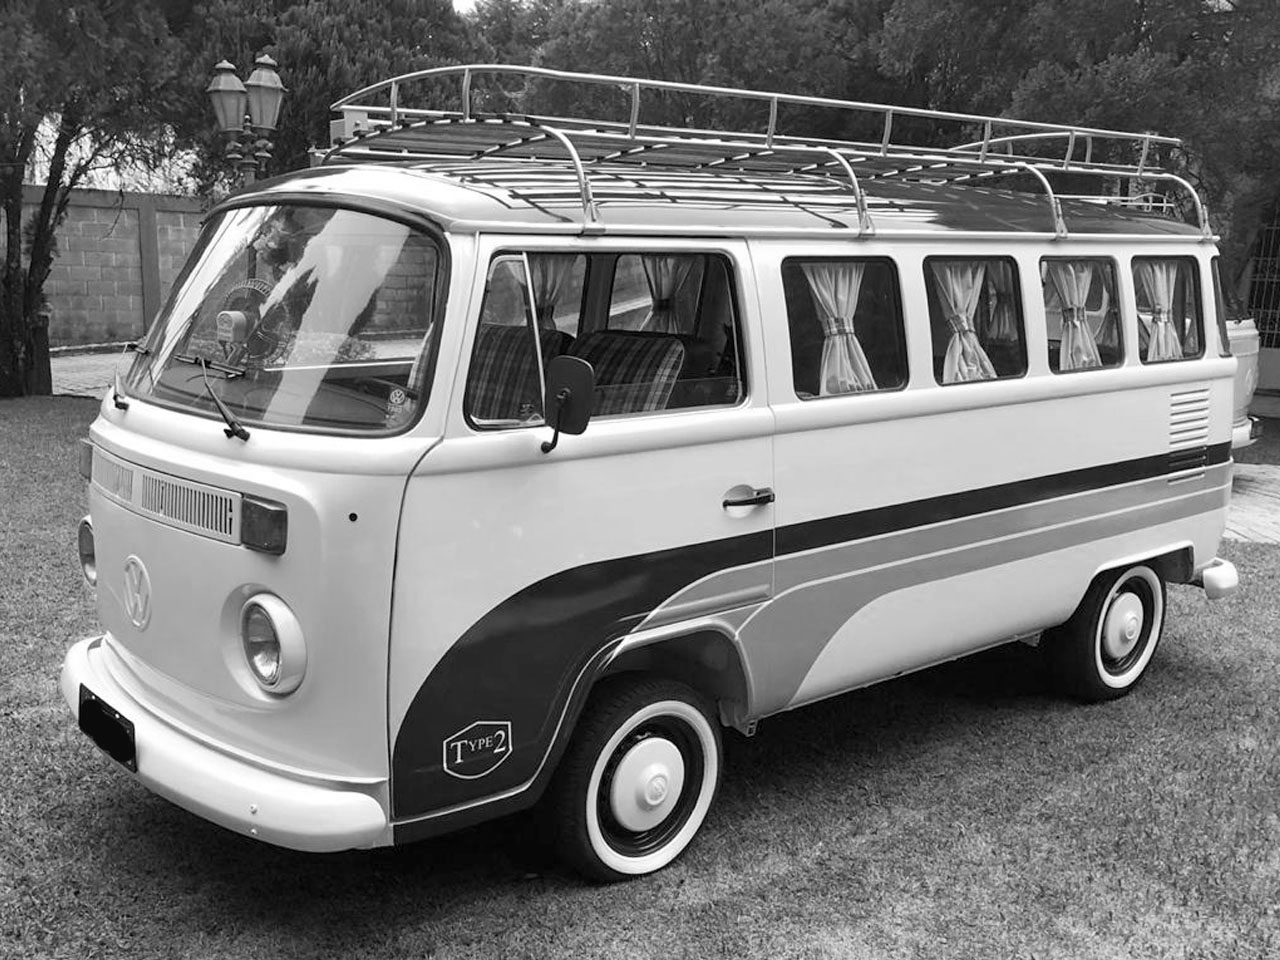 VW Kombi Camper Branca e Azul 1983 – Tema Surf